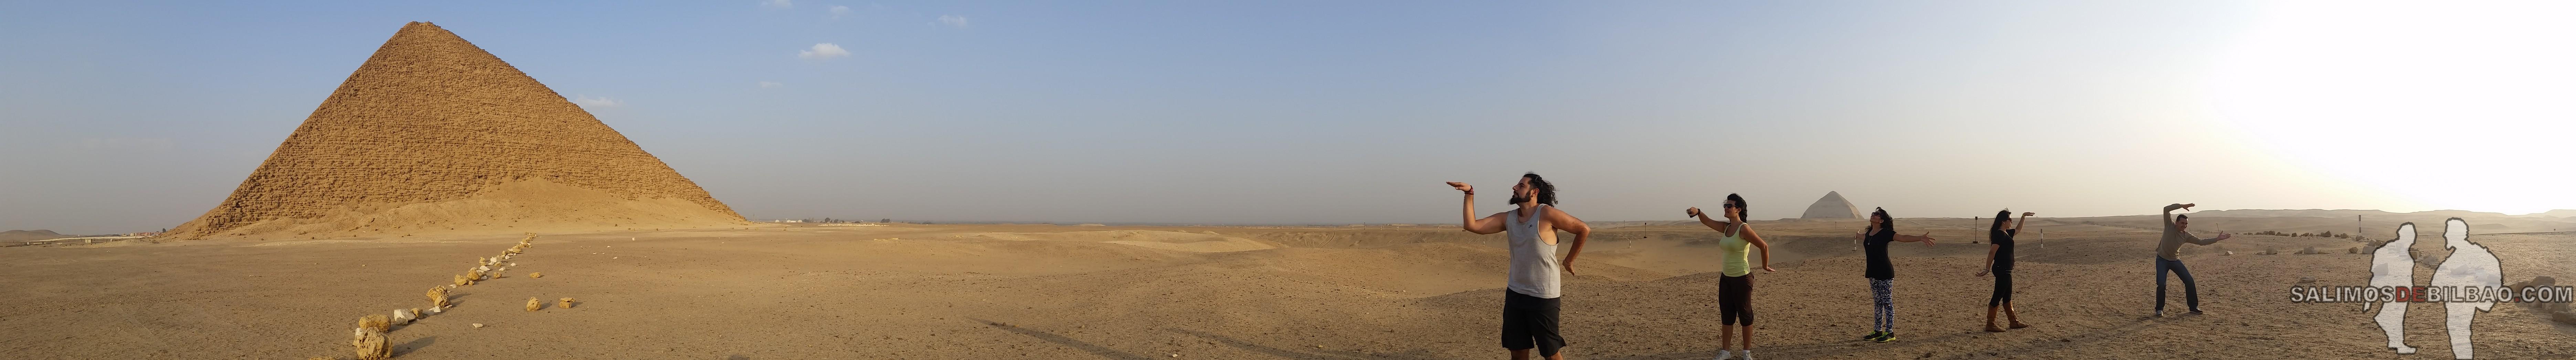 0238. Grupo, Pirámide roja de Saqqara 1